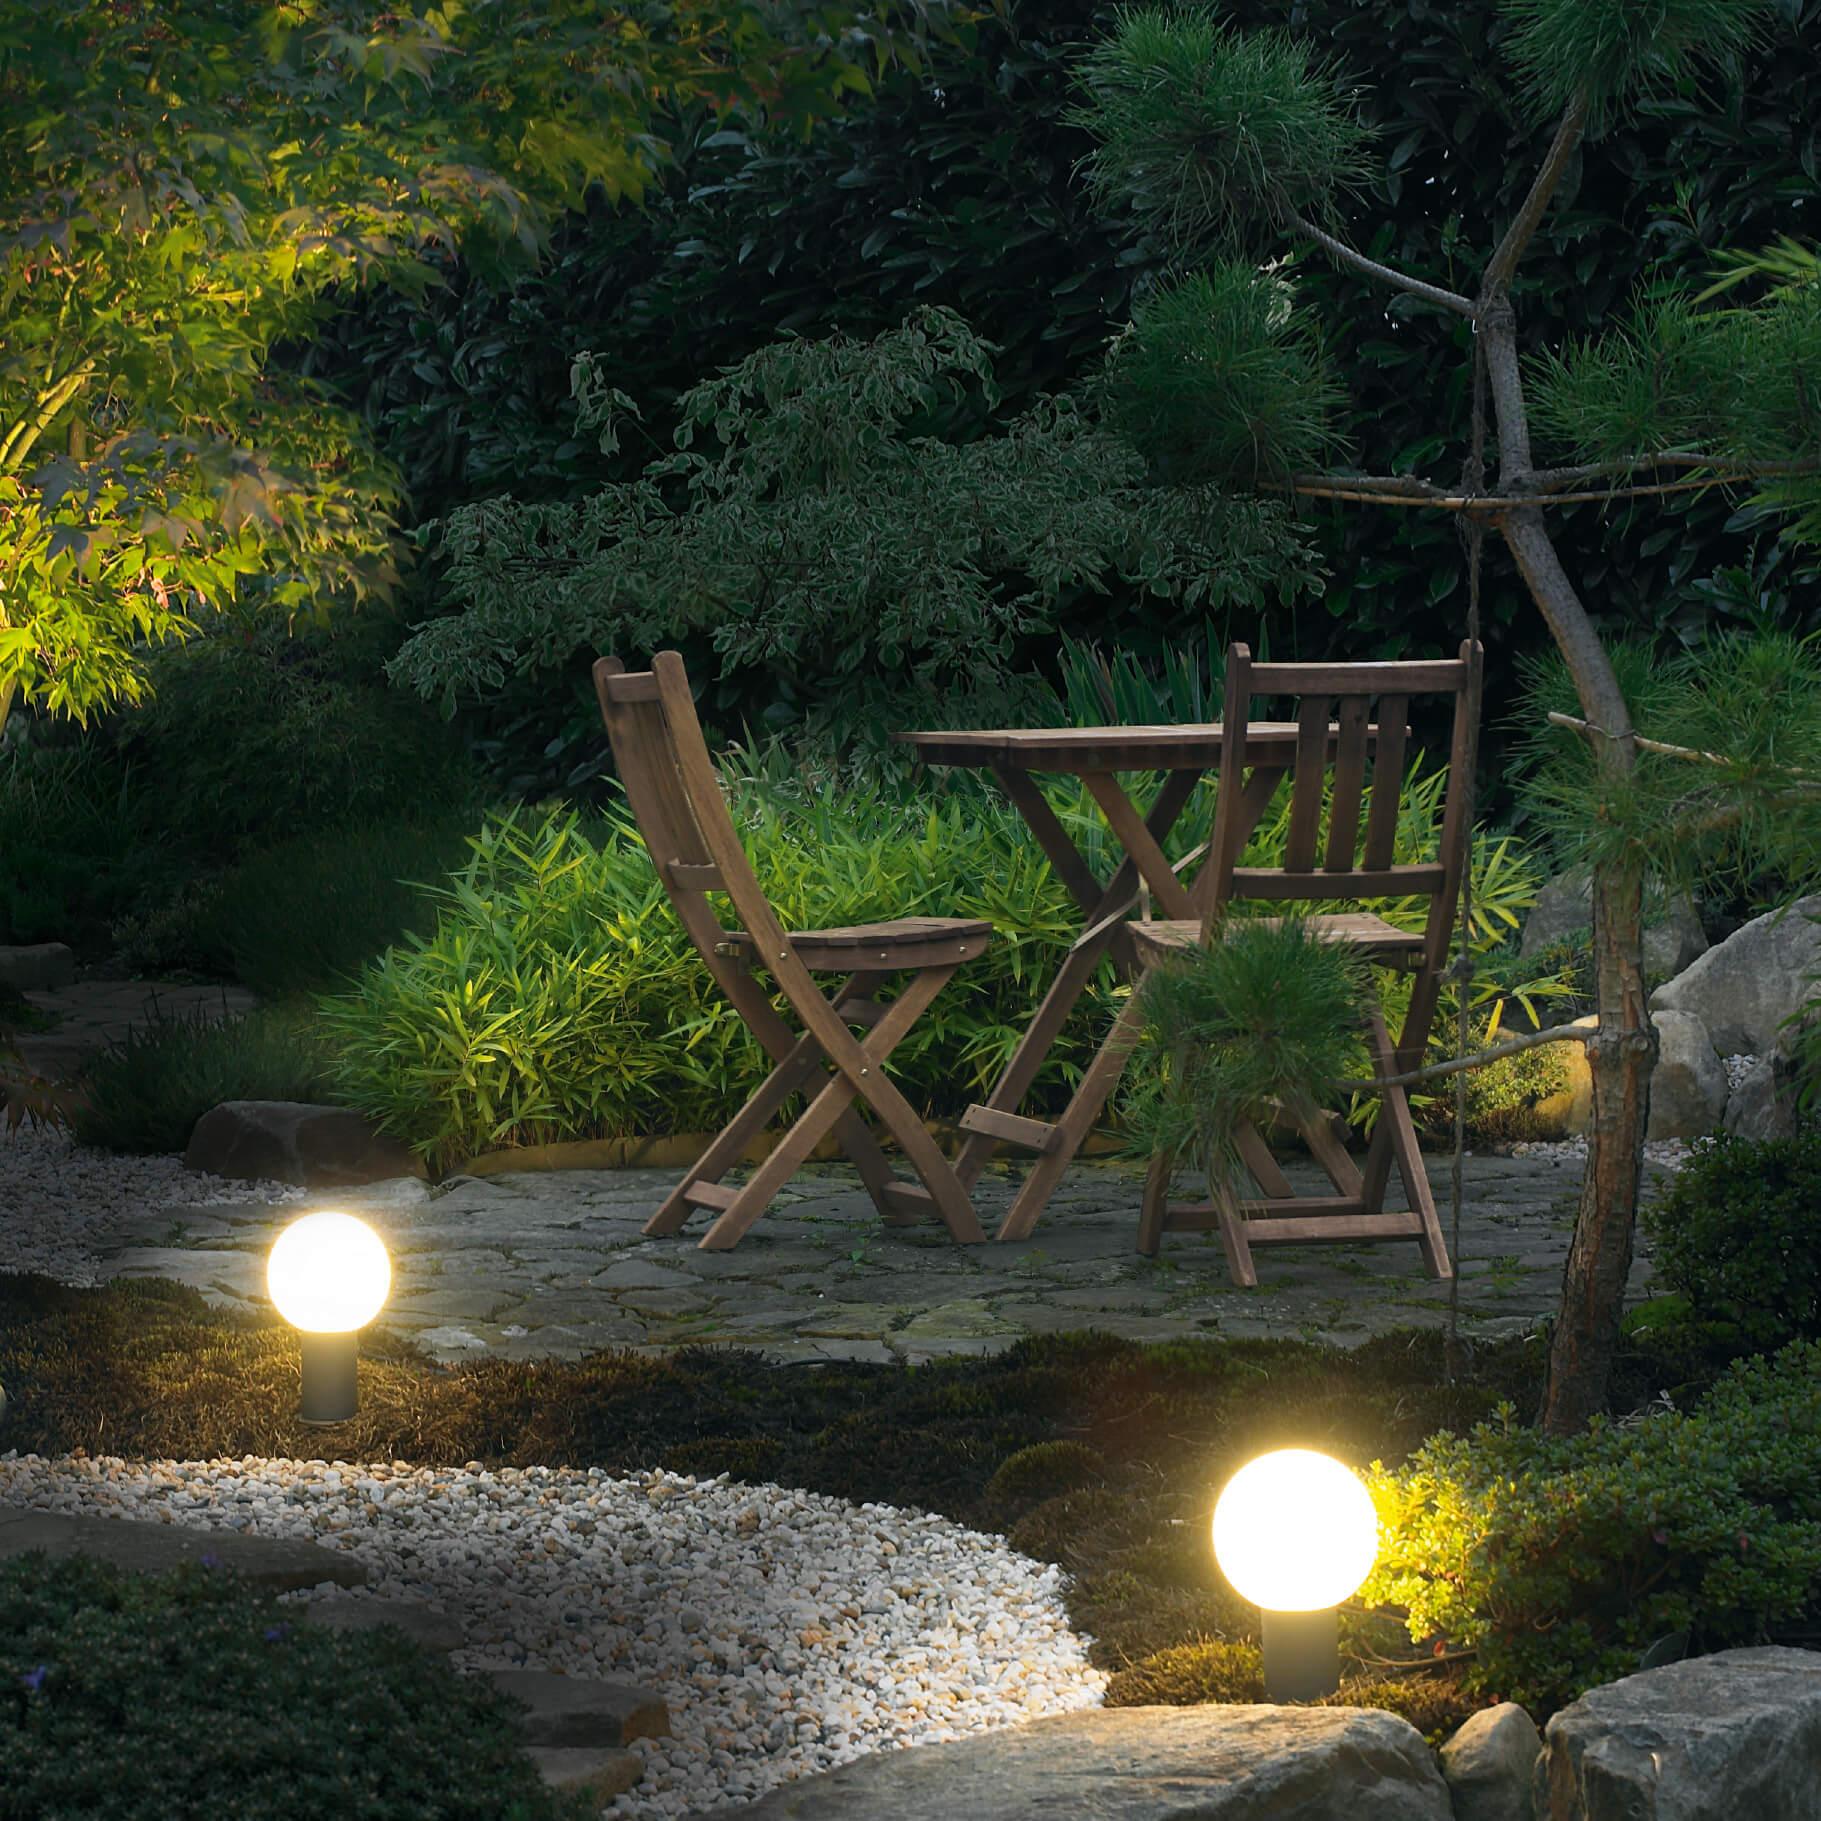 AN00038_55038BEGA-LED-Gartenleuchte-mit-Erdspiess_Produktbild_1-1